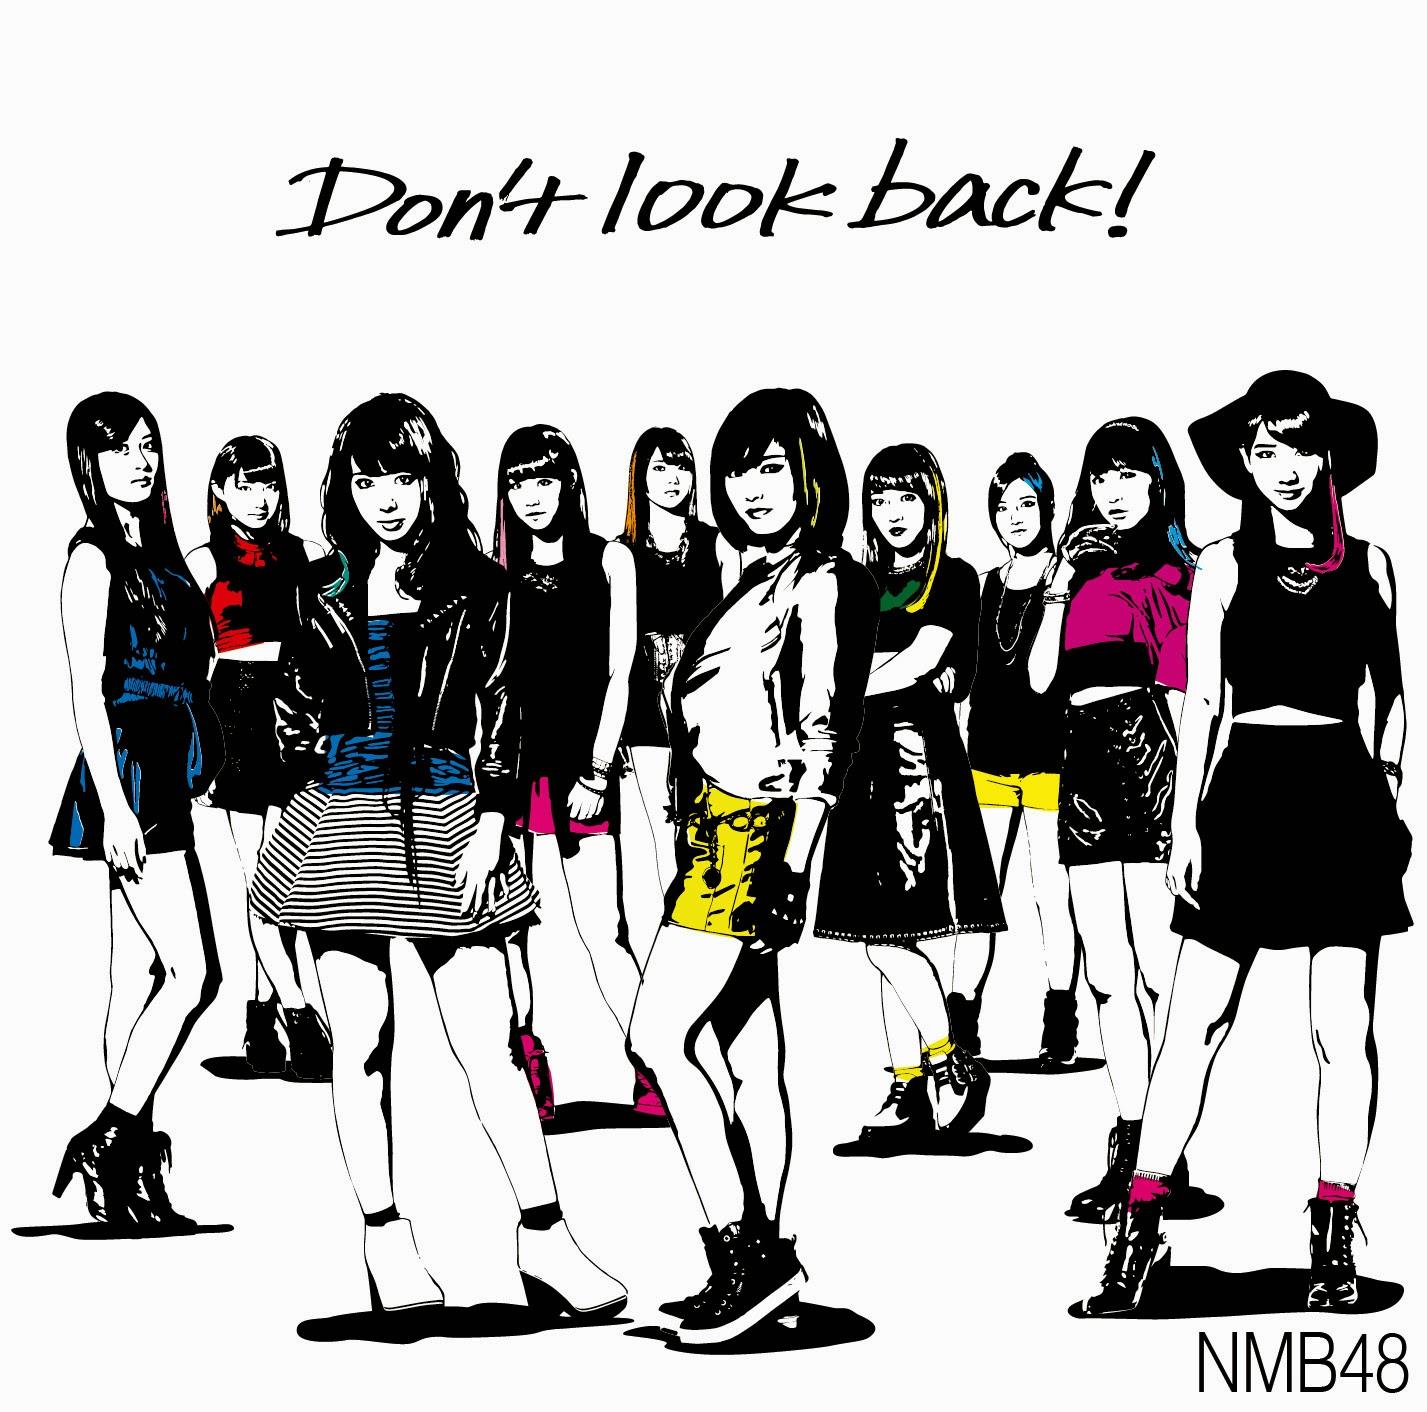 Type A (Reguler Edition)  CD:  1. Don't look back!(by Member Pilihan) 2. TBA (Lagu Sambungan Umum) 3. Renai Petenshi (恋愛ペテン師) (by Team N member) 4. Don't look back! (off vocal version) 5. TBA (off vocal version) 6. Renai Petenshi (off vocal version)  DVD: 1. [MV] Don't look back 2. [MV] Don't look back  (Dancing version) 3. [MV] Renai Petenshi 4. [MV] Seishun no Lap Time (青春のラップタイム)